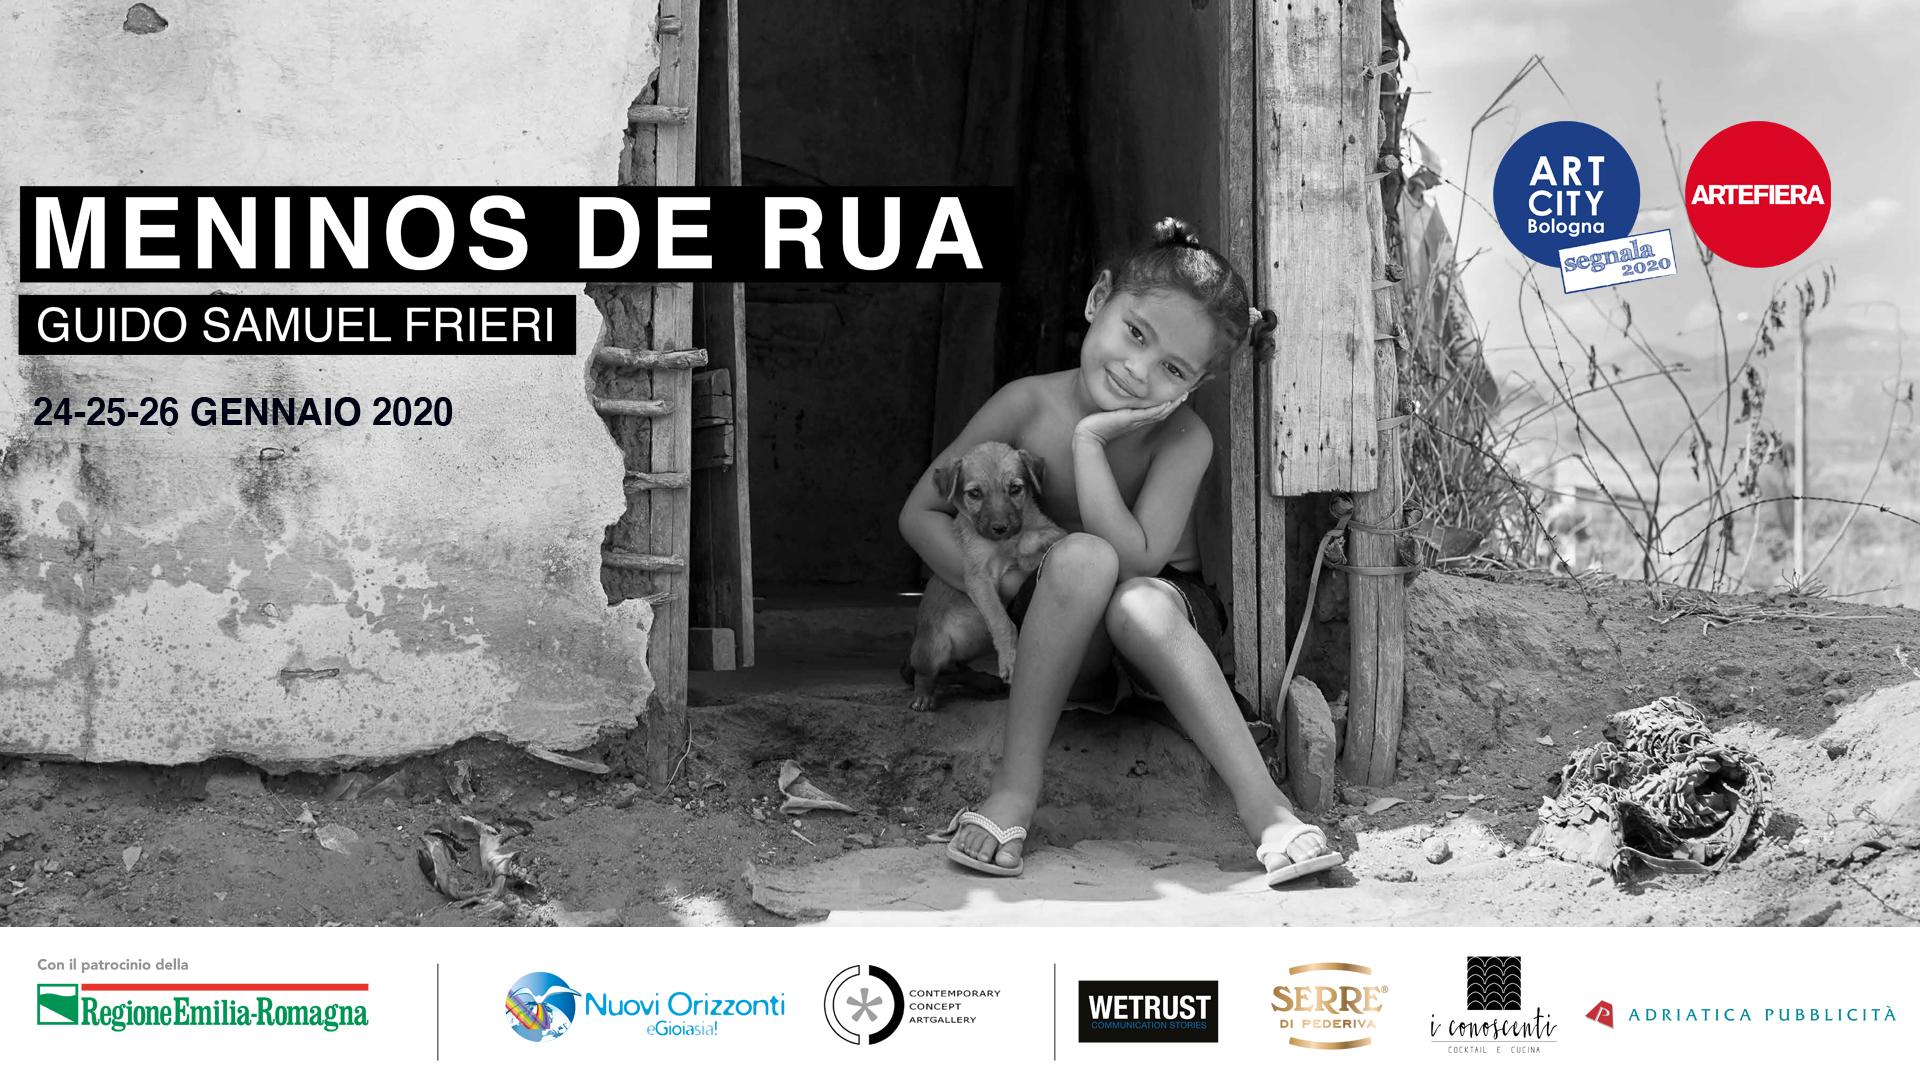 Meninos de Rua - Mostra fotografica Brasile - Nuovi Orizzonti